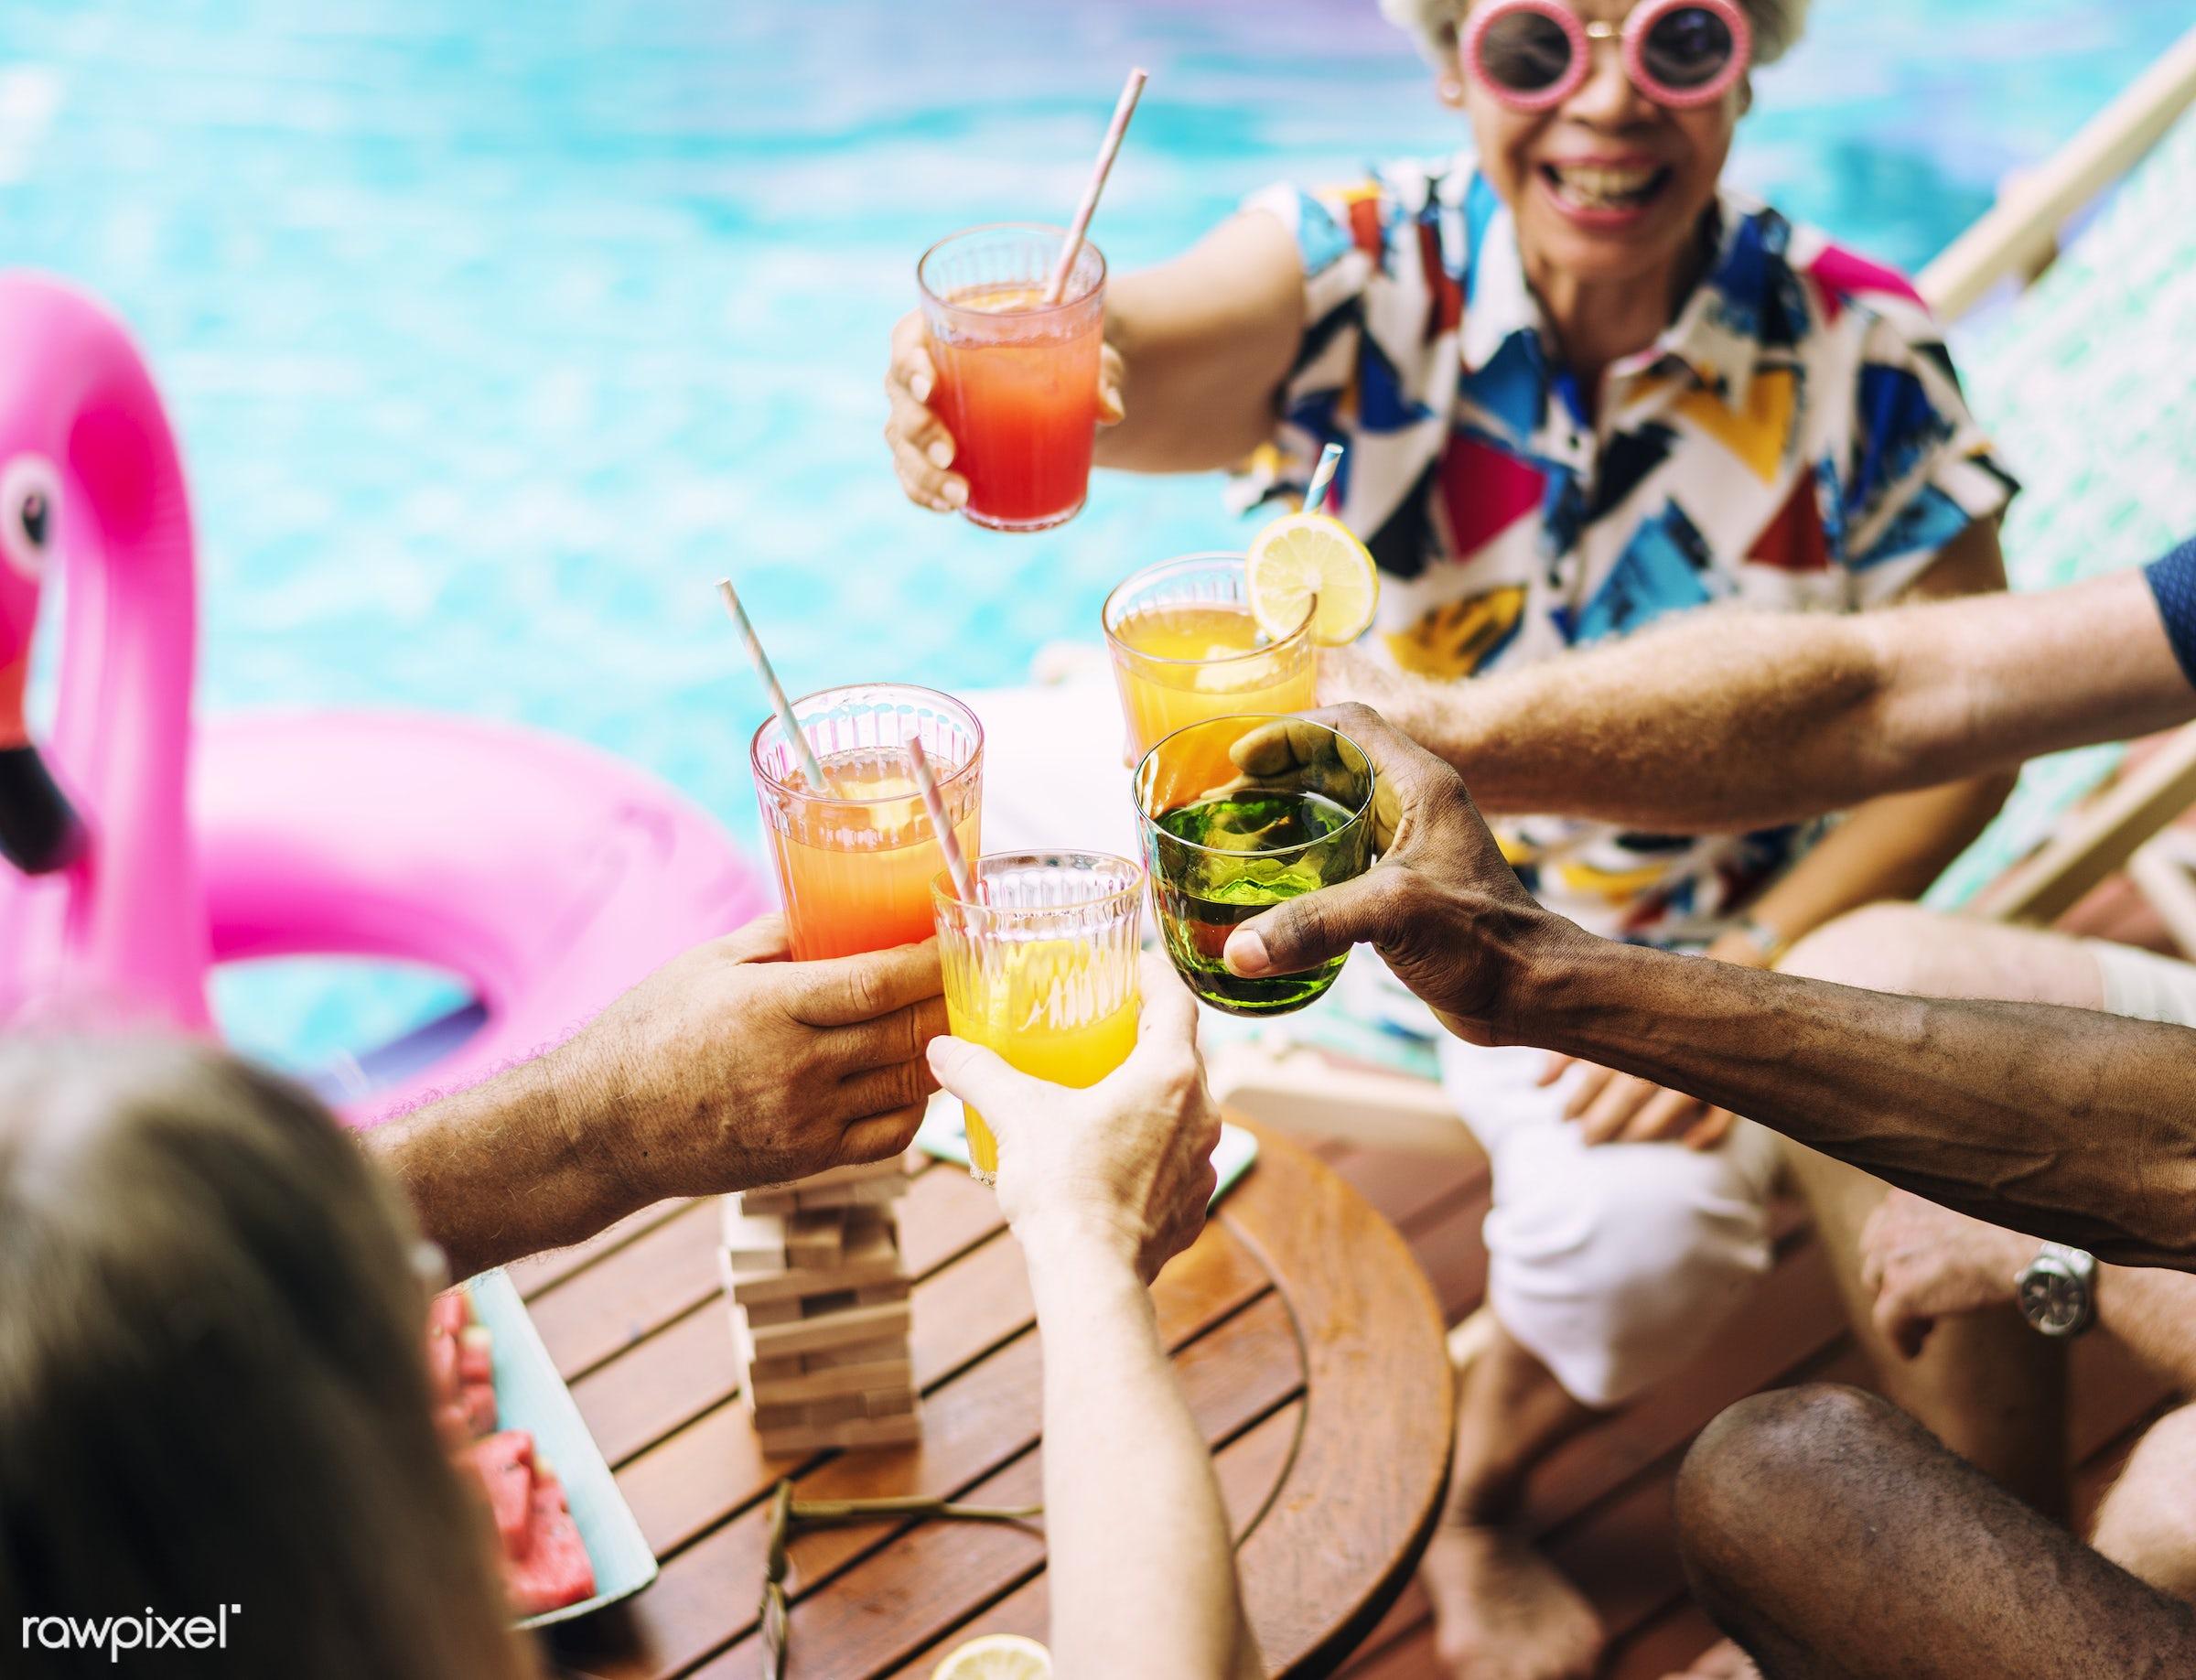 Group of diverse senior adult enjoying beverage by the pool together - beverage, closeup, diverse, drinks, enjoy, enjoyment...